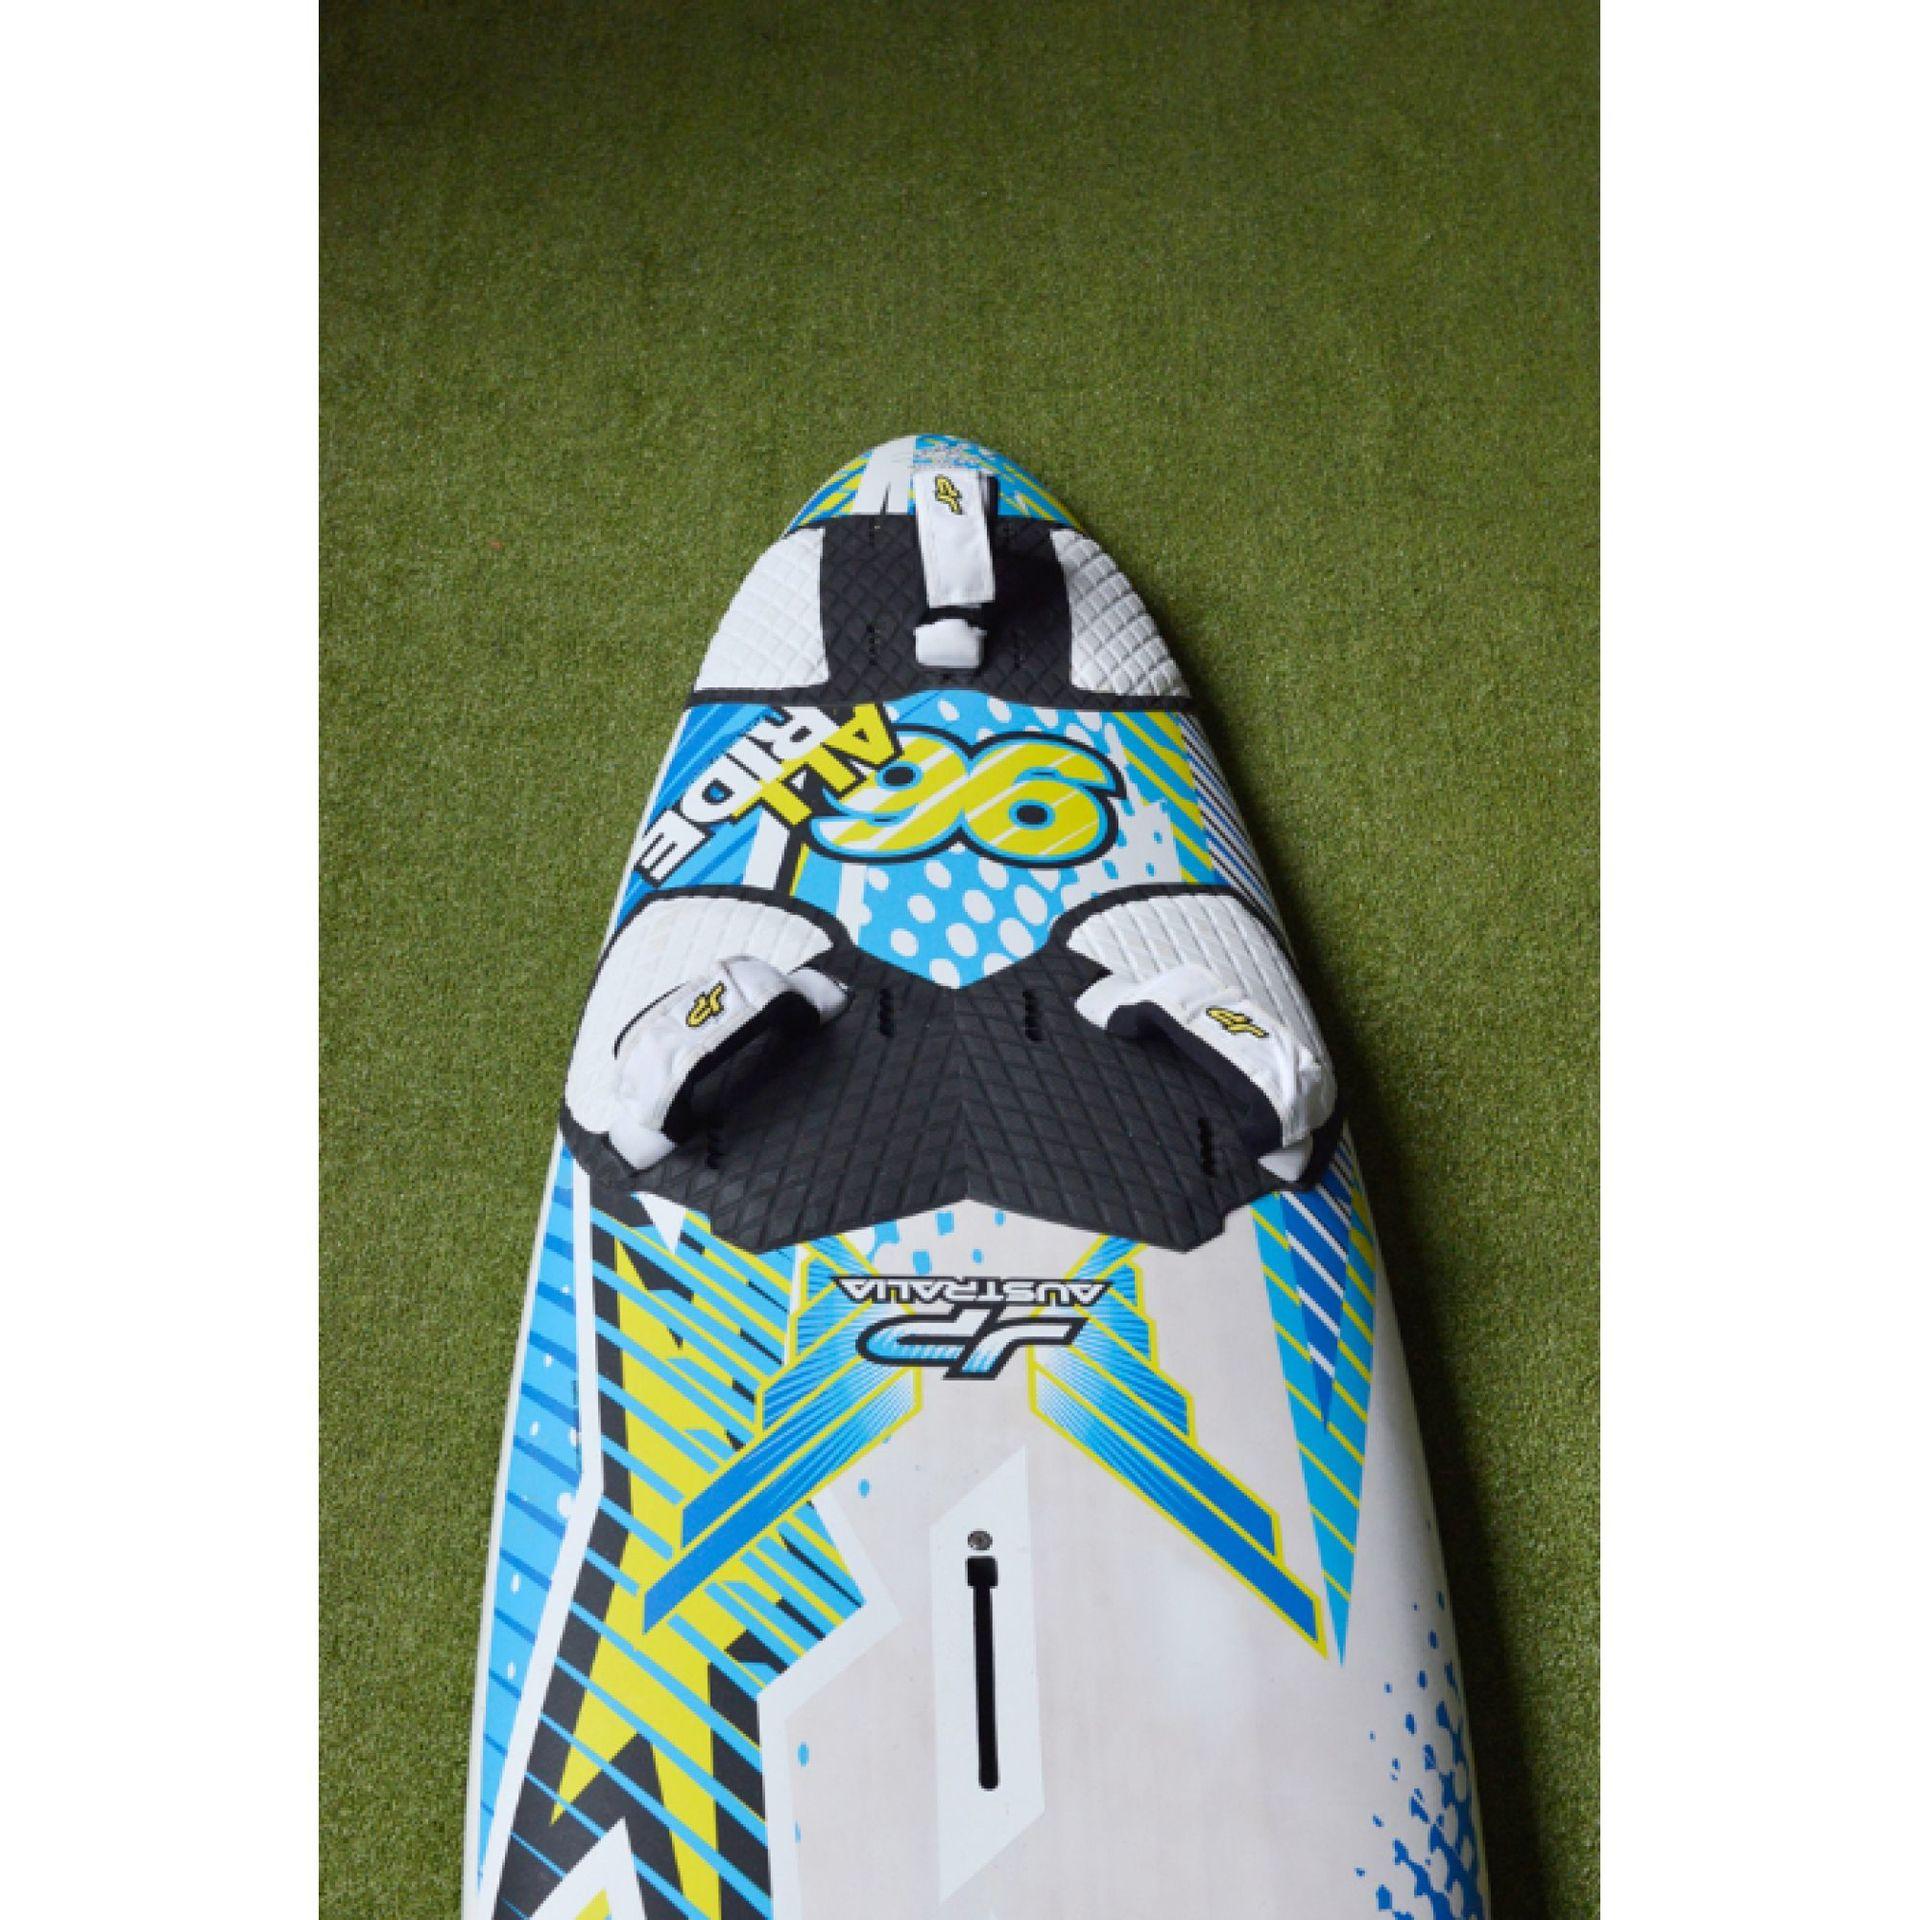 Deska windsurfingowa JP All Ride  961302 2